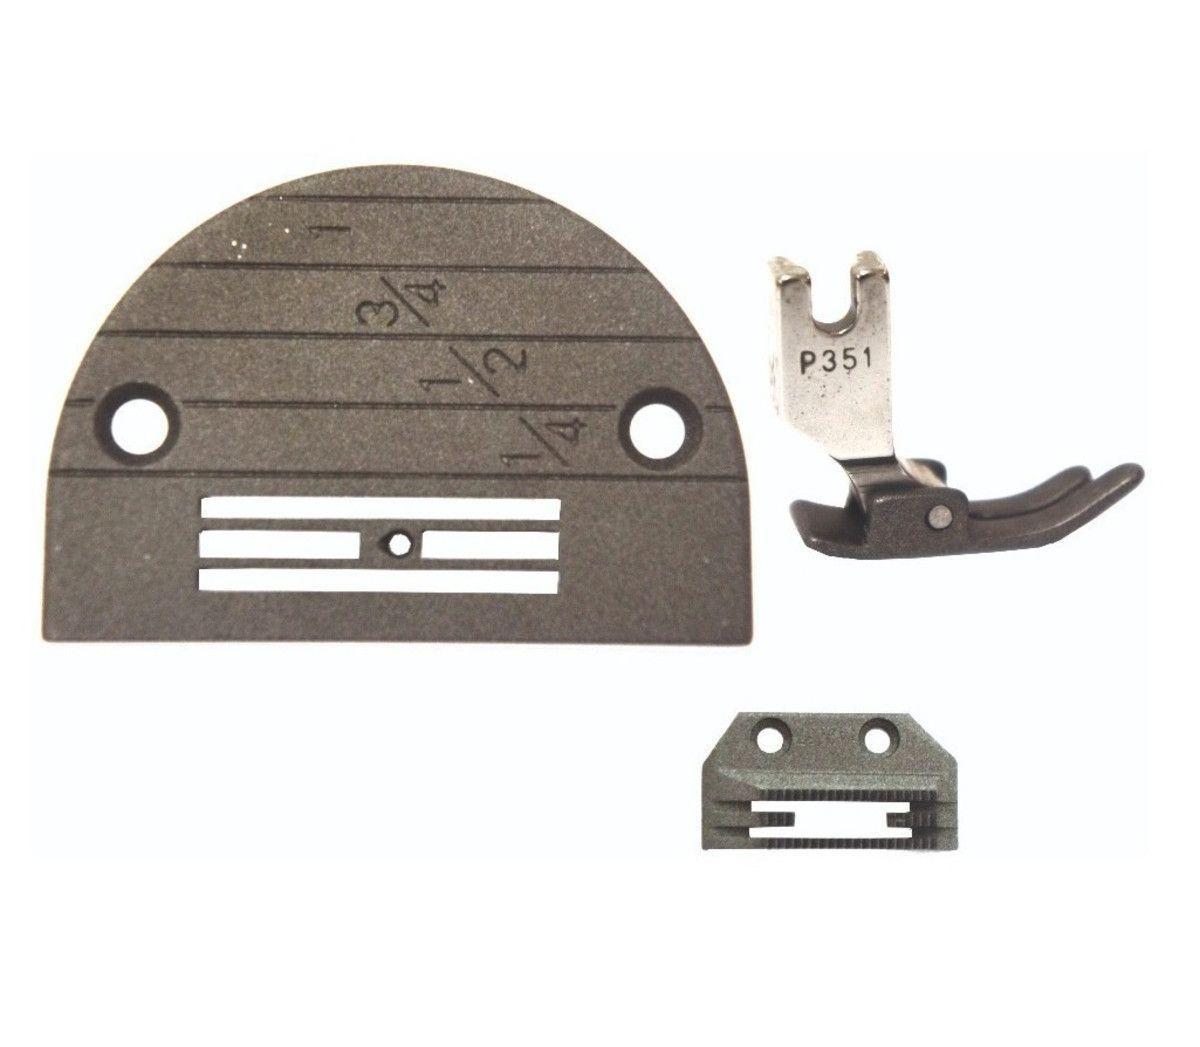 Conjunto Reta, Chapa Dente e Calcador (MT18) 3 Carreiras Pesado